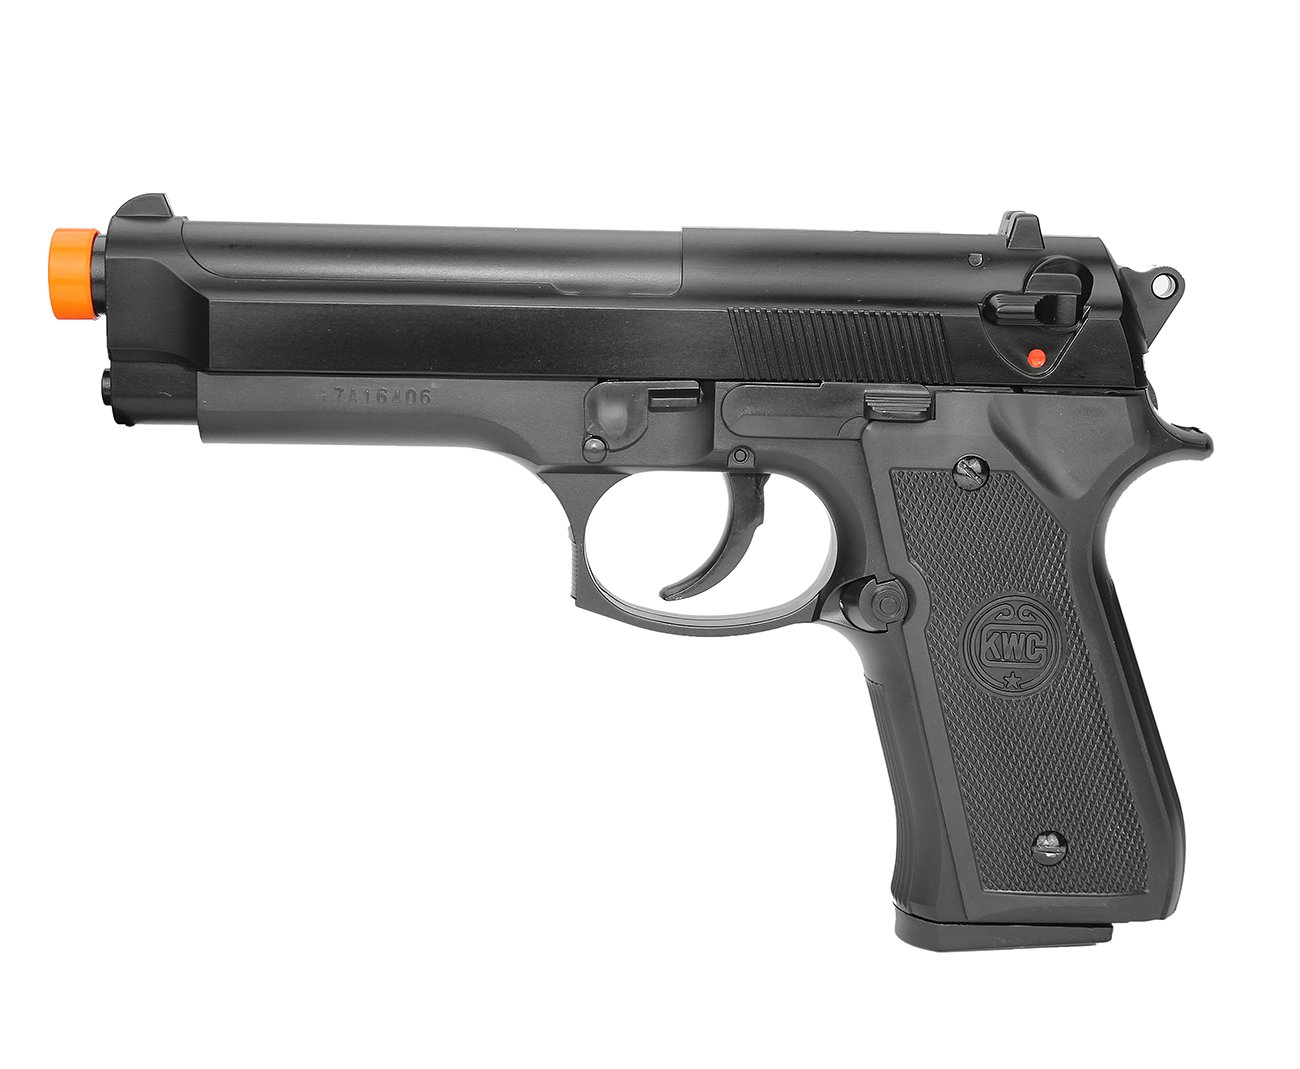 Pistola De Airsoft Beretta M92 Spring Cal 6.0 Mm Kwc